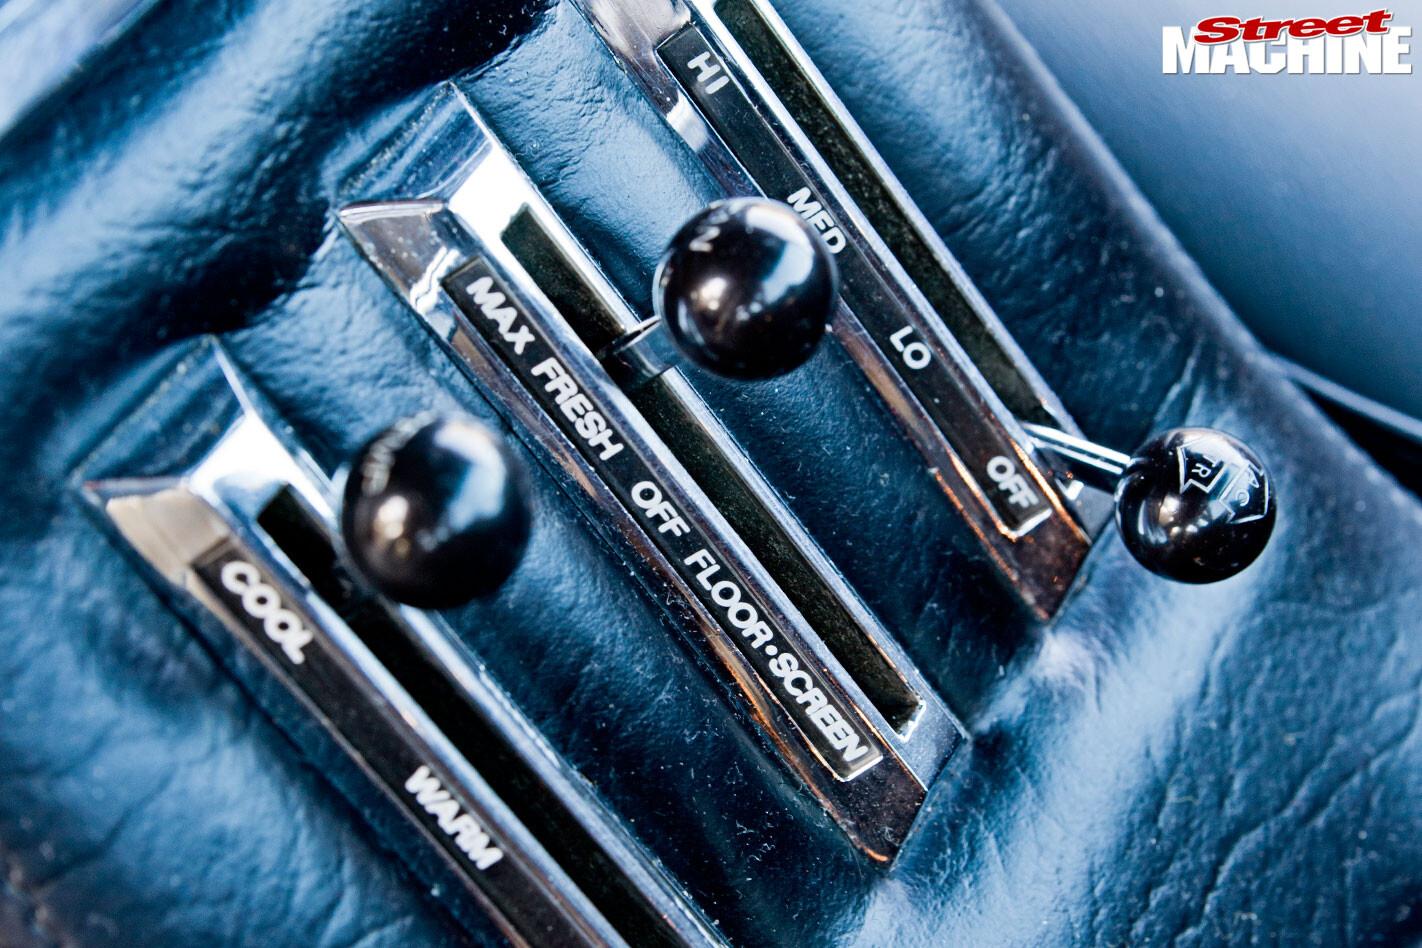 Ford Landau switches